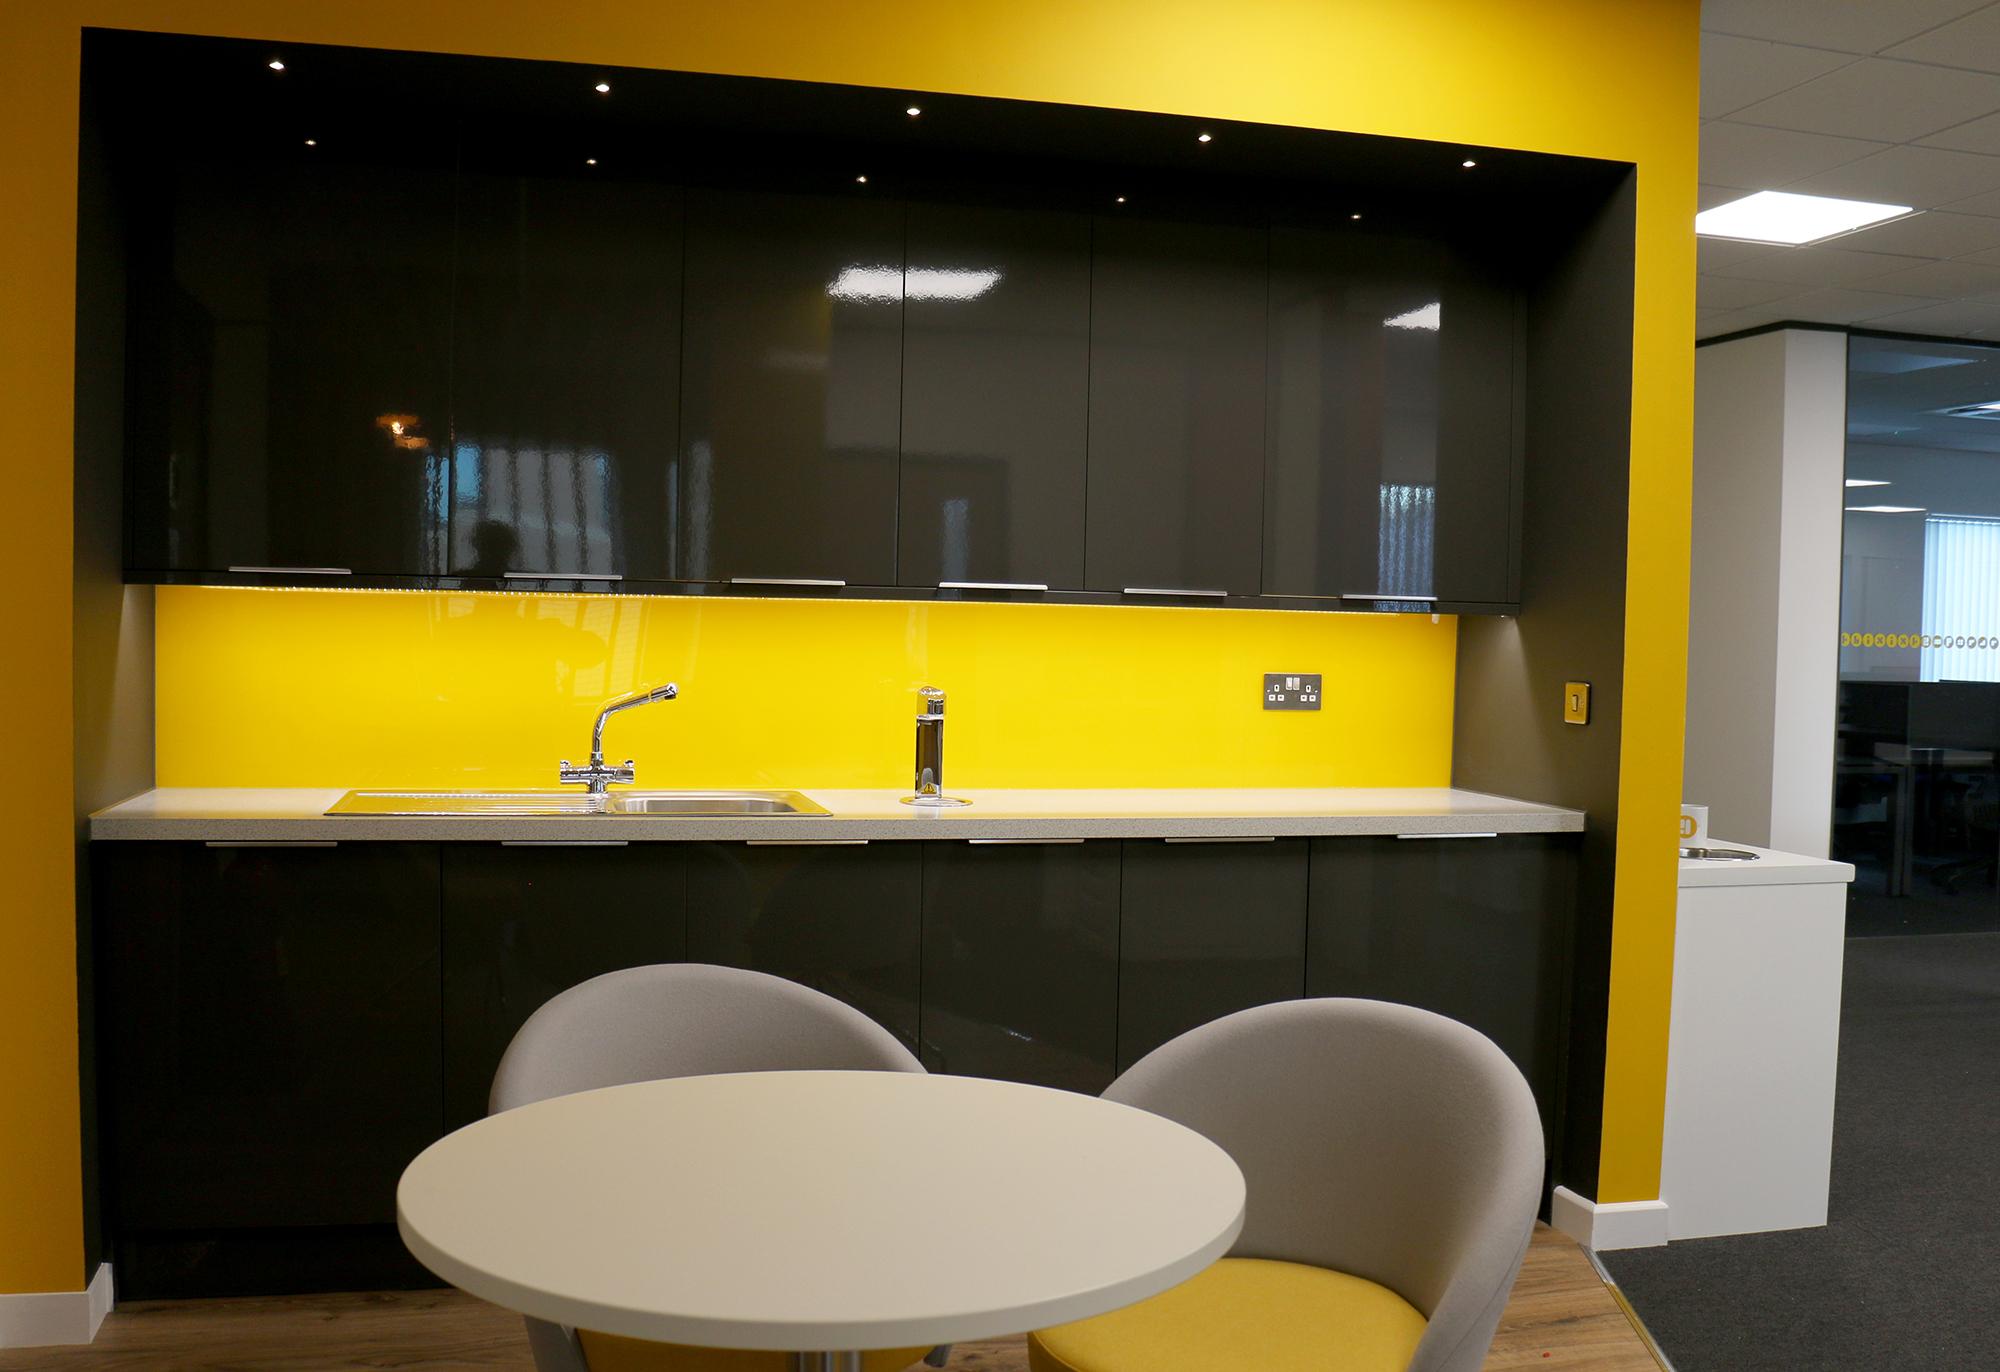 Office kitchen with bright yellow splashback